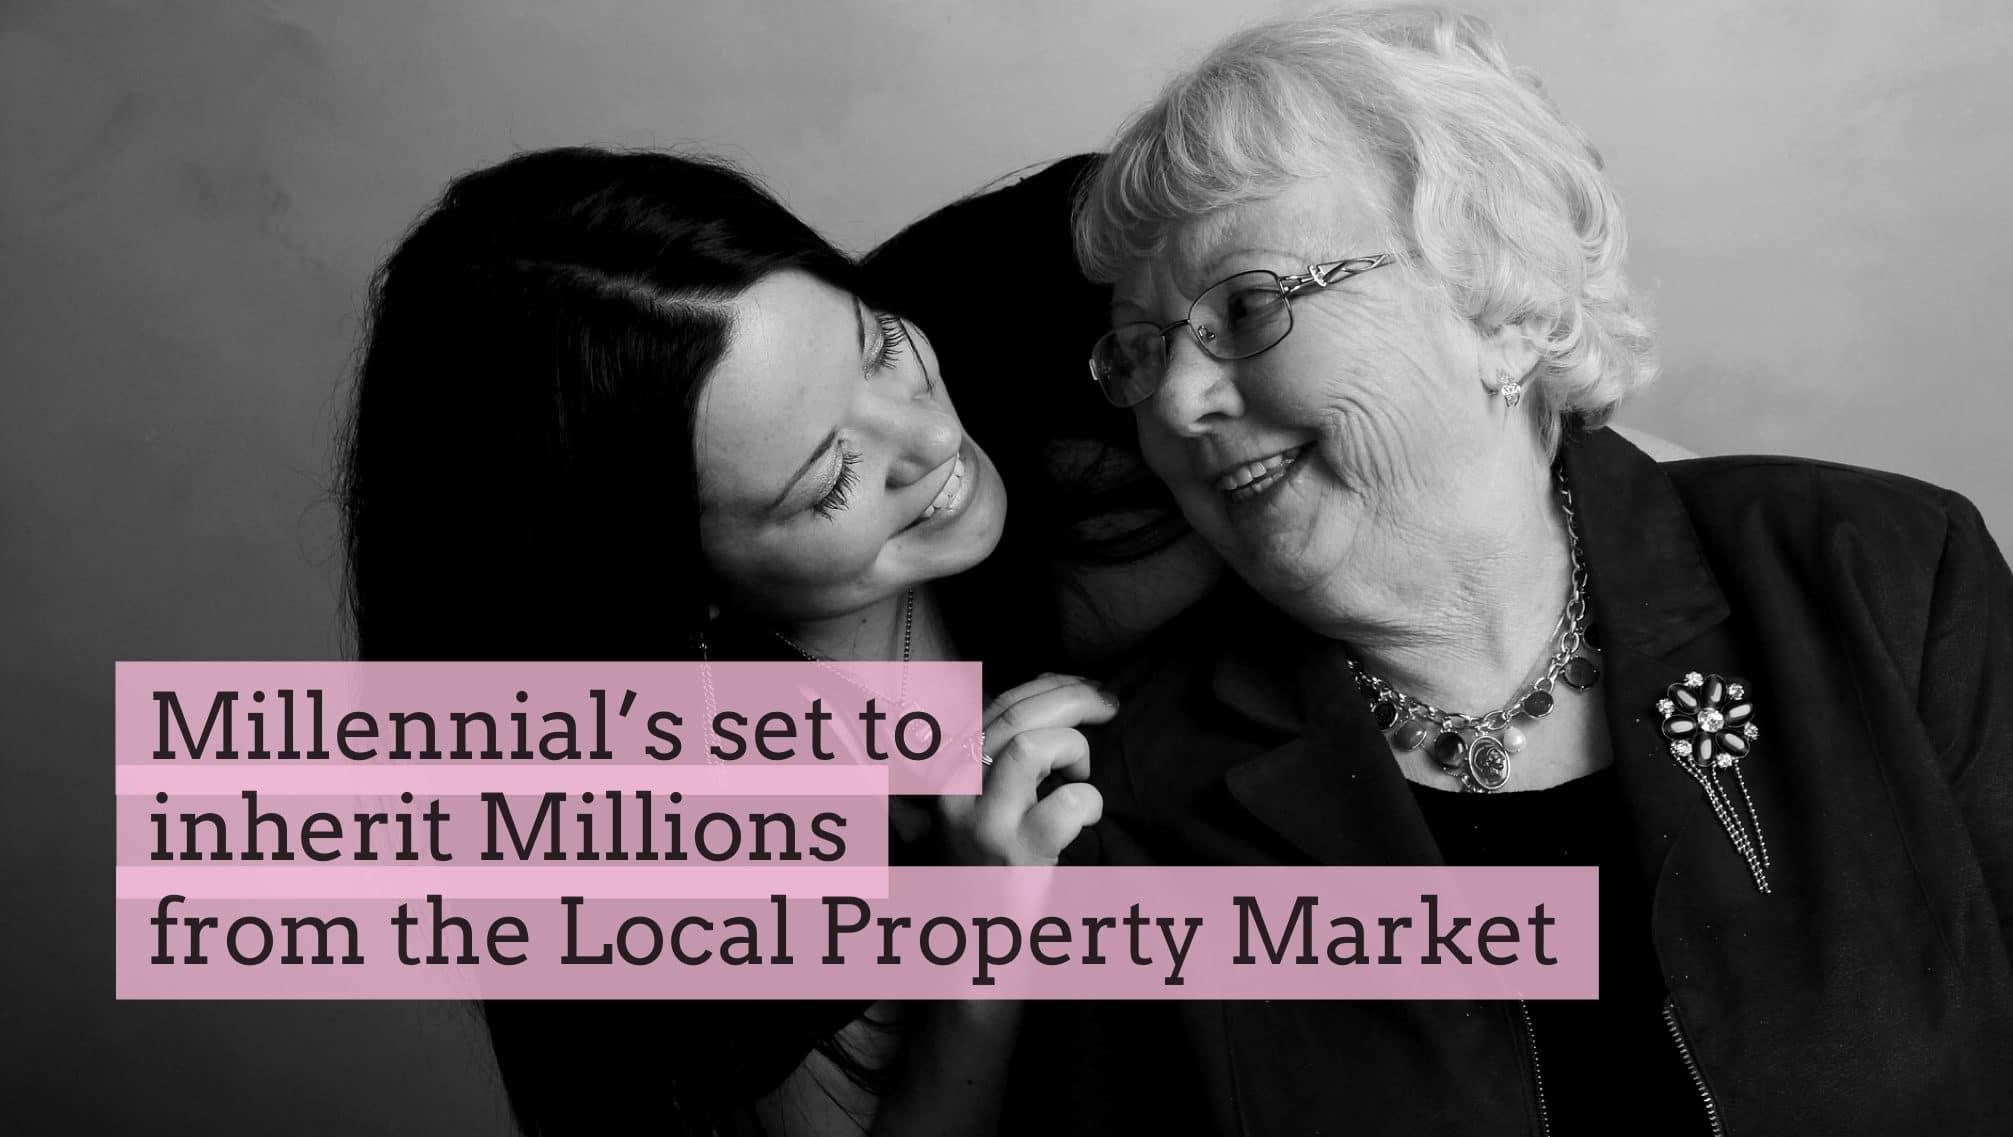 Canterbury's 'Millennials' set to inherit £112,947 each in property!